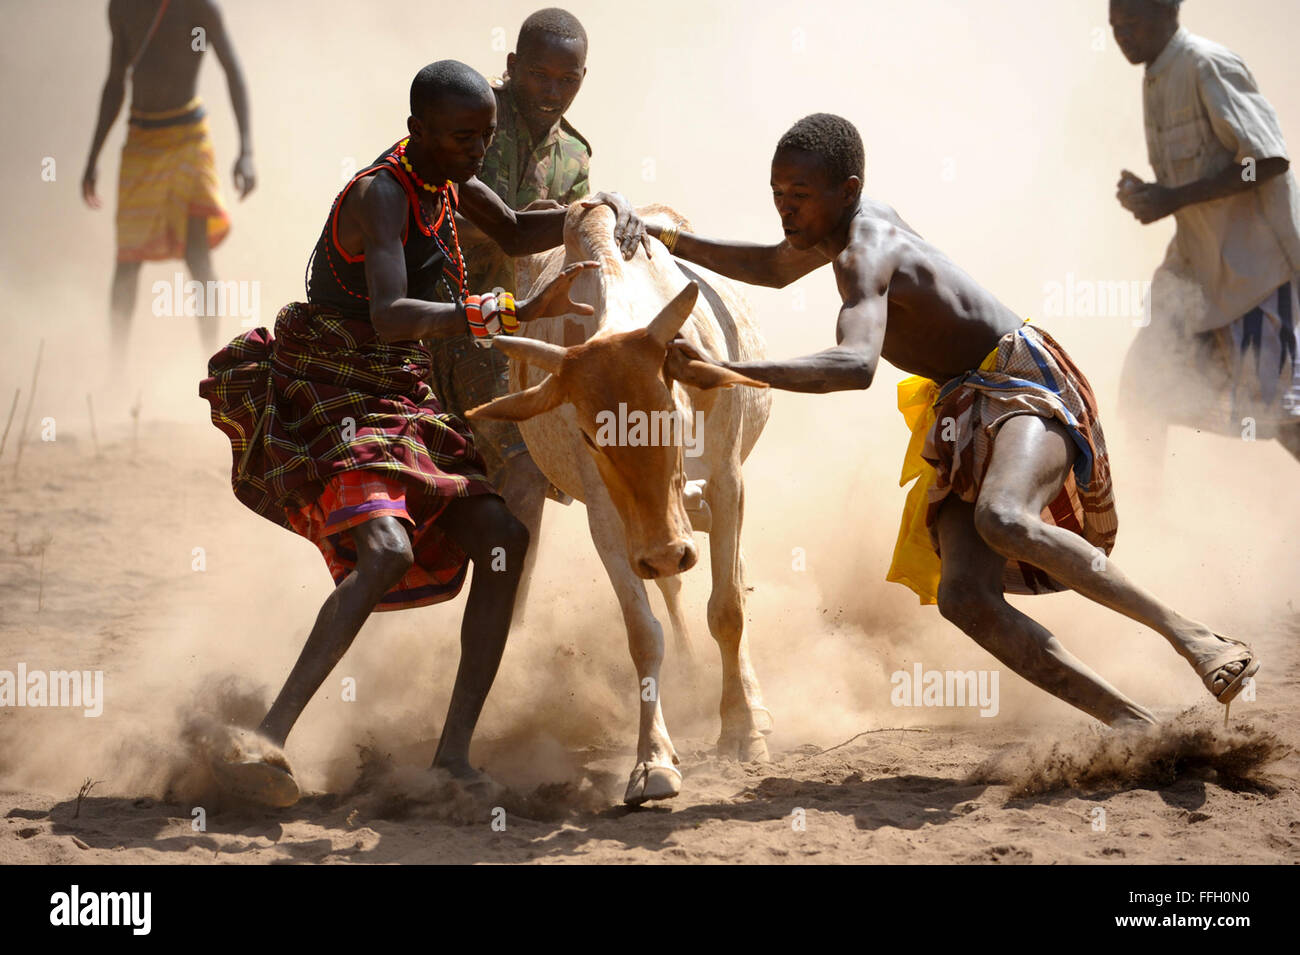 Gli uomini locali tentativo di sottomettere un runaway bull Aug.t 5, 2012 in Daaba, Kenya. Combined Joint Task Force Immagini Stock